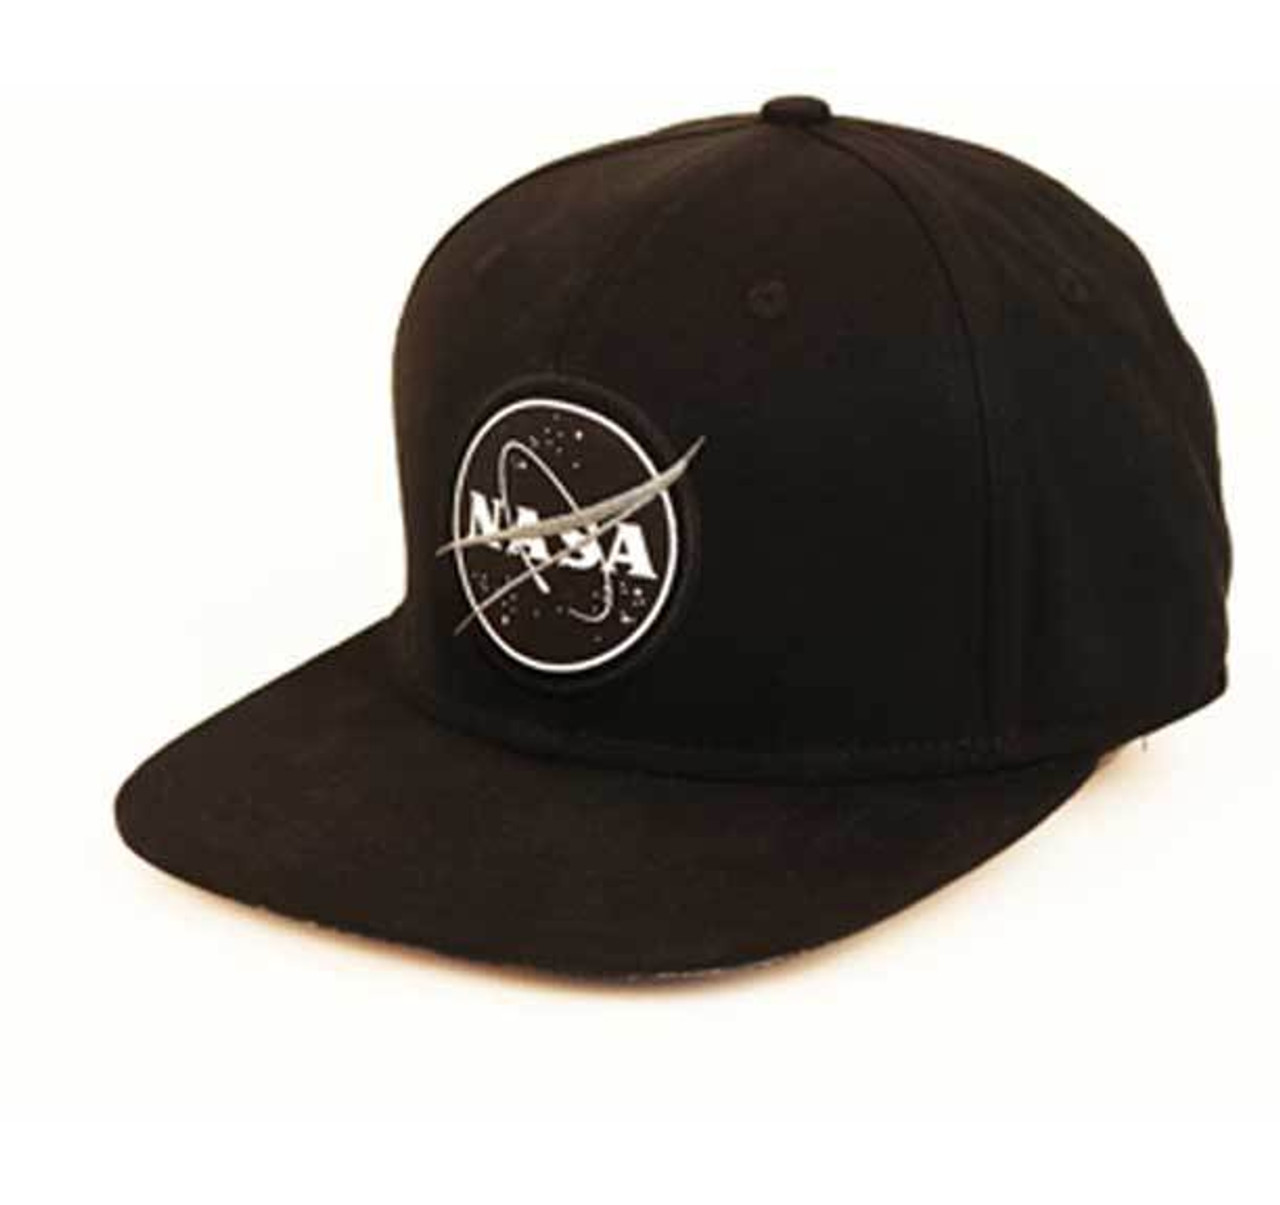 9e6f986a96b NASA Glow in the Dark USA Space Galaxy Snapback Baseball Cap Hat  SB03983NASU - Fearless Apparel